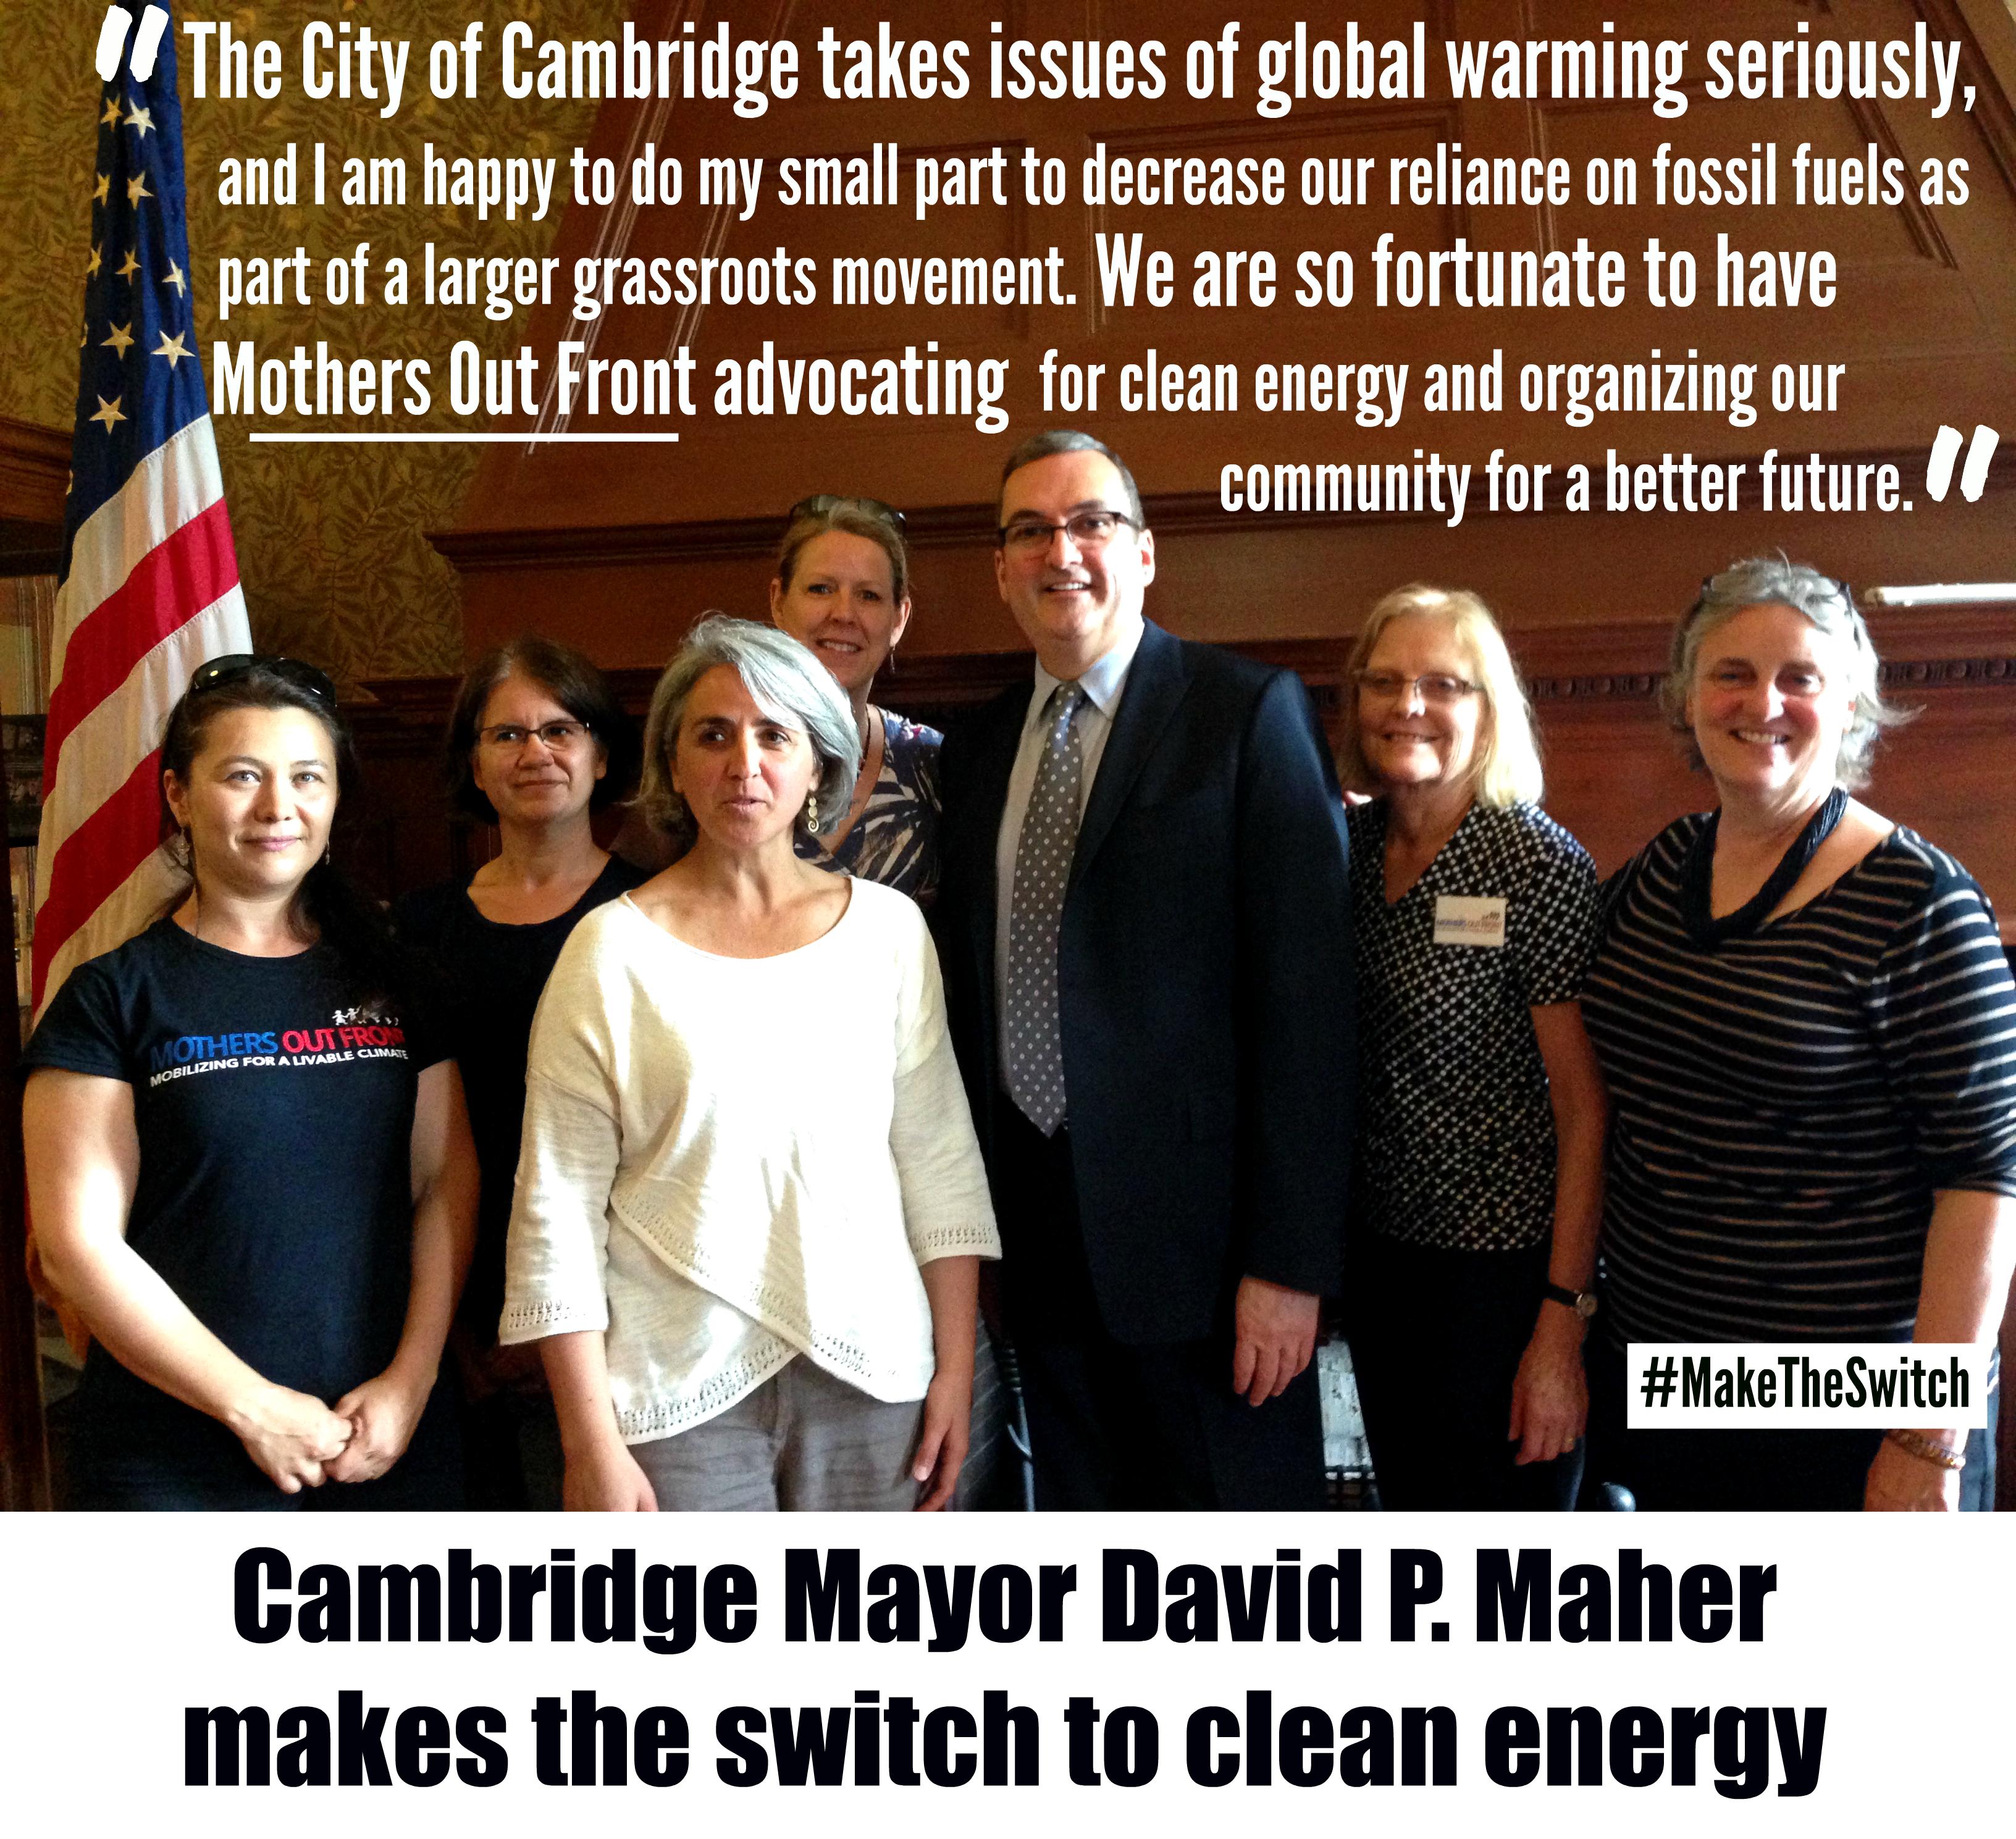 Cambridge_Mayor_SwitchMeme_David_P_Maher_July_2015.jpg